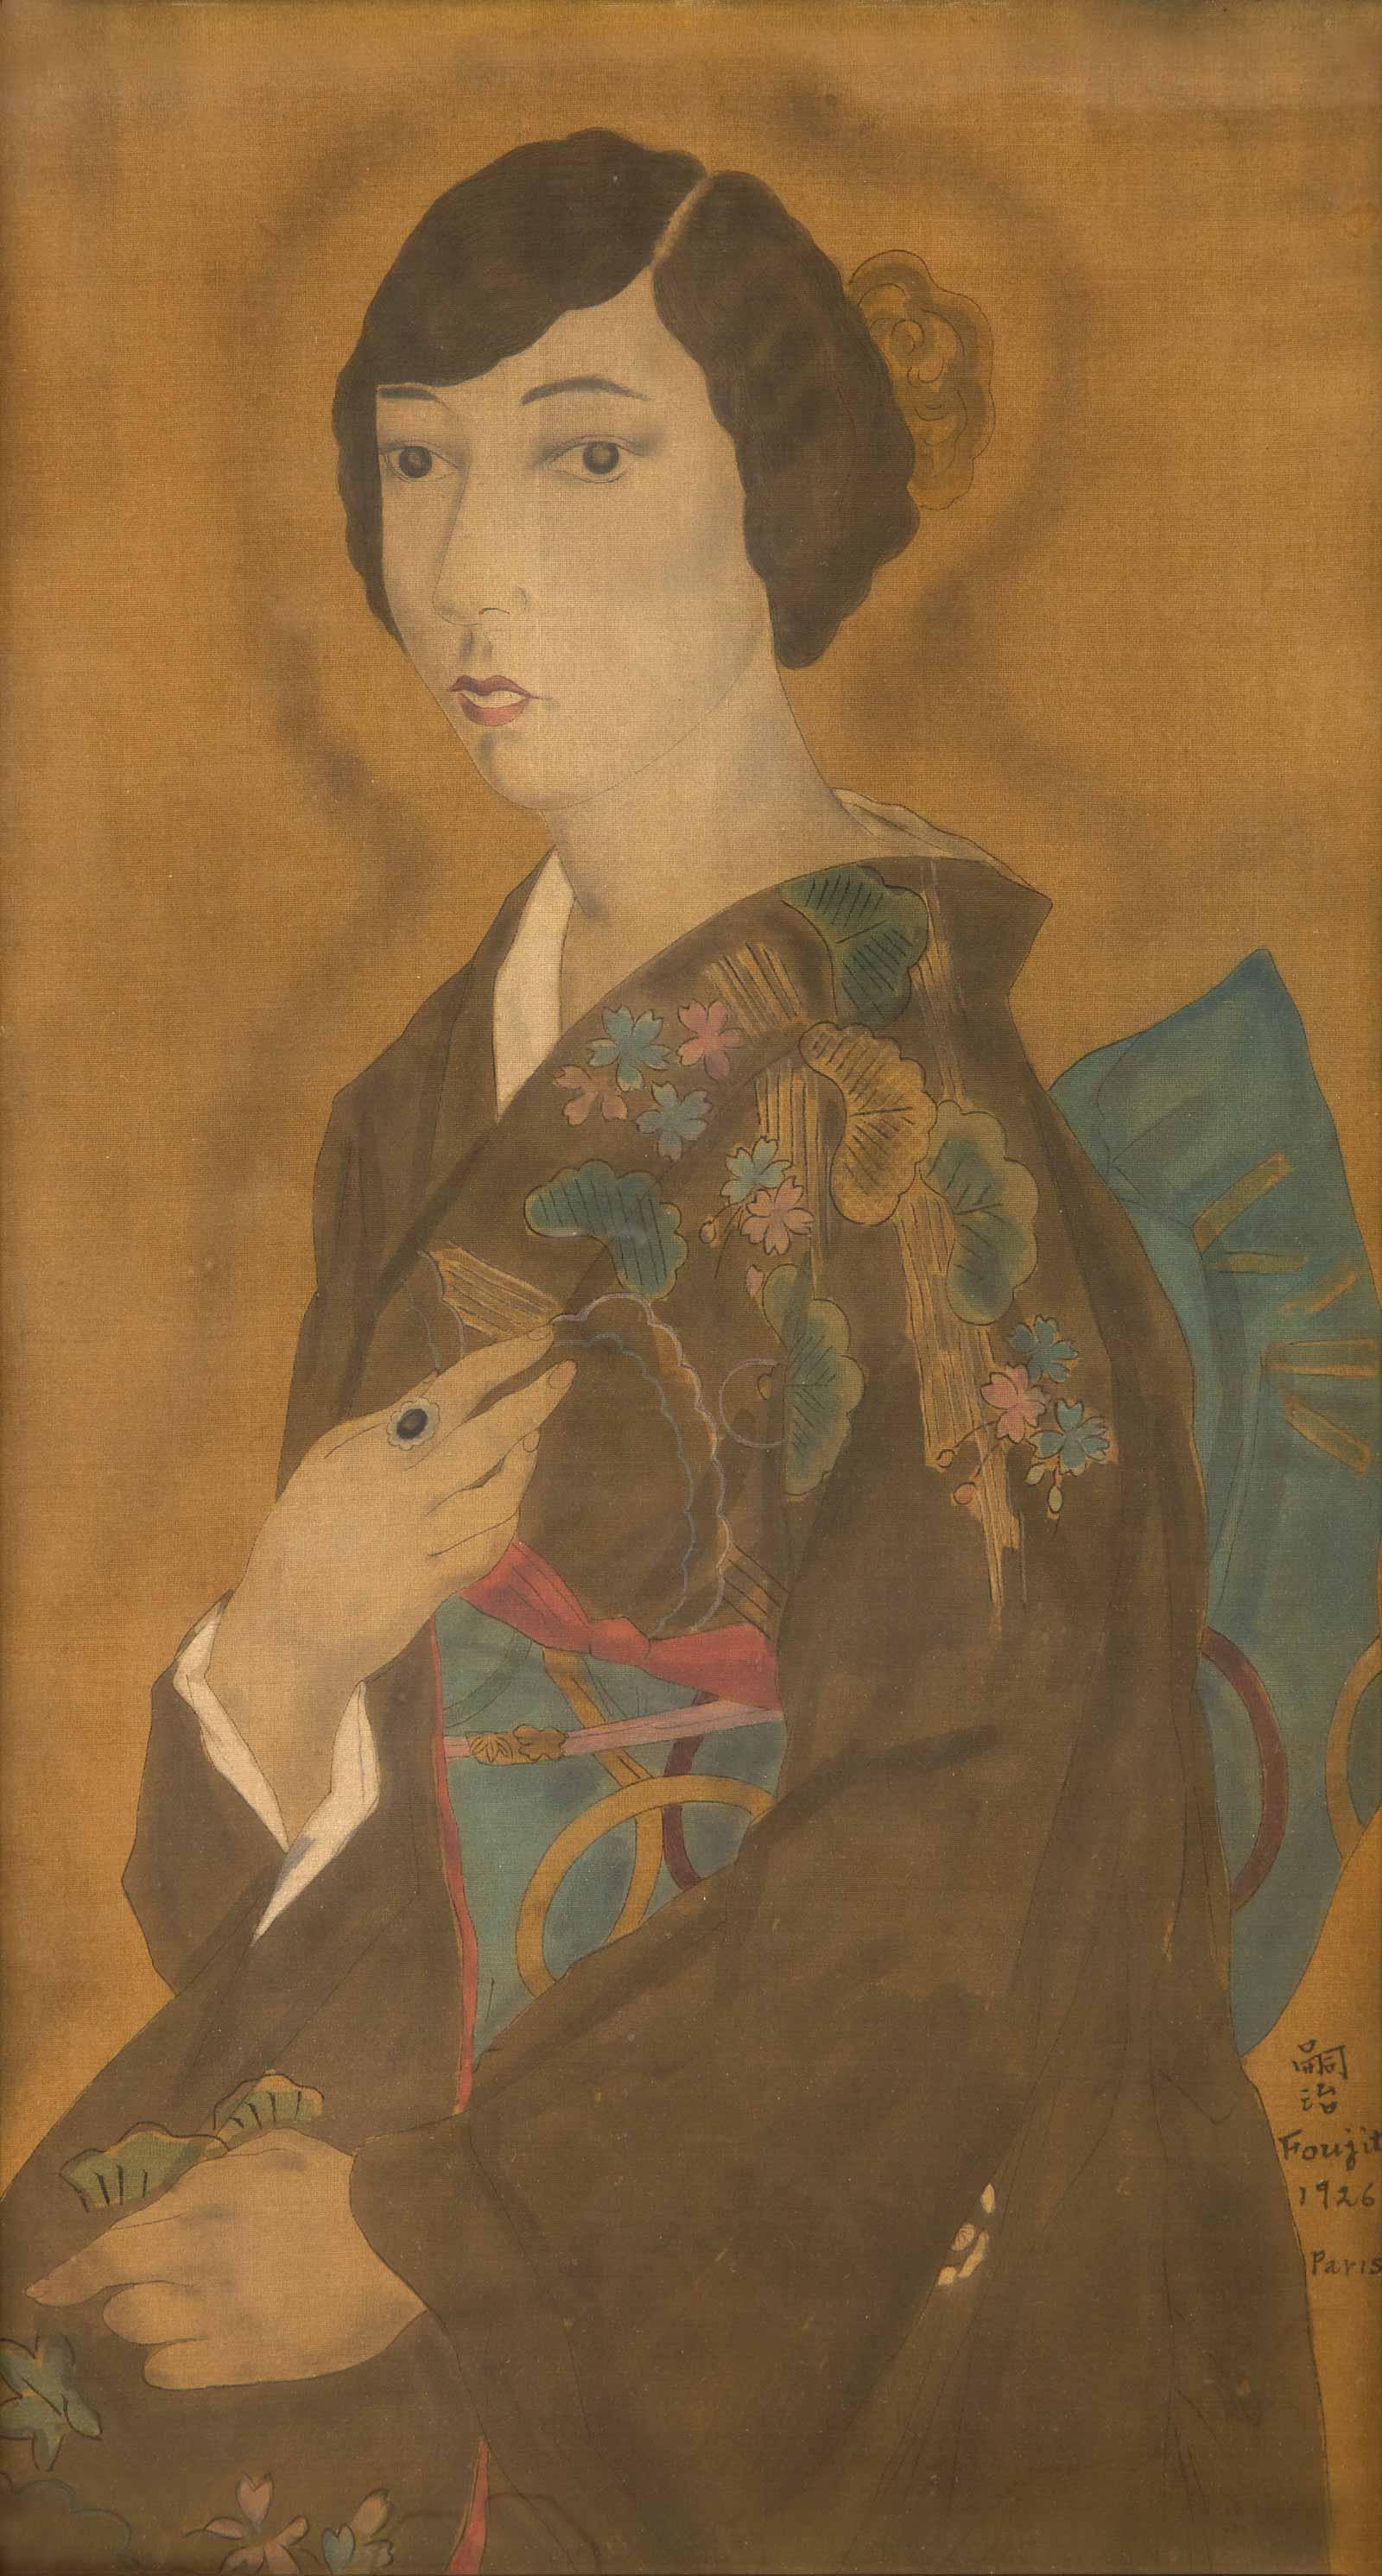 1527422081_549_Foujita-Imperial-Japan-Meets-Bohemian-Paris-by-Aaron-Peck-NYR-Daily.jpg